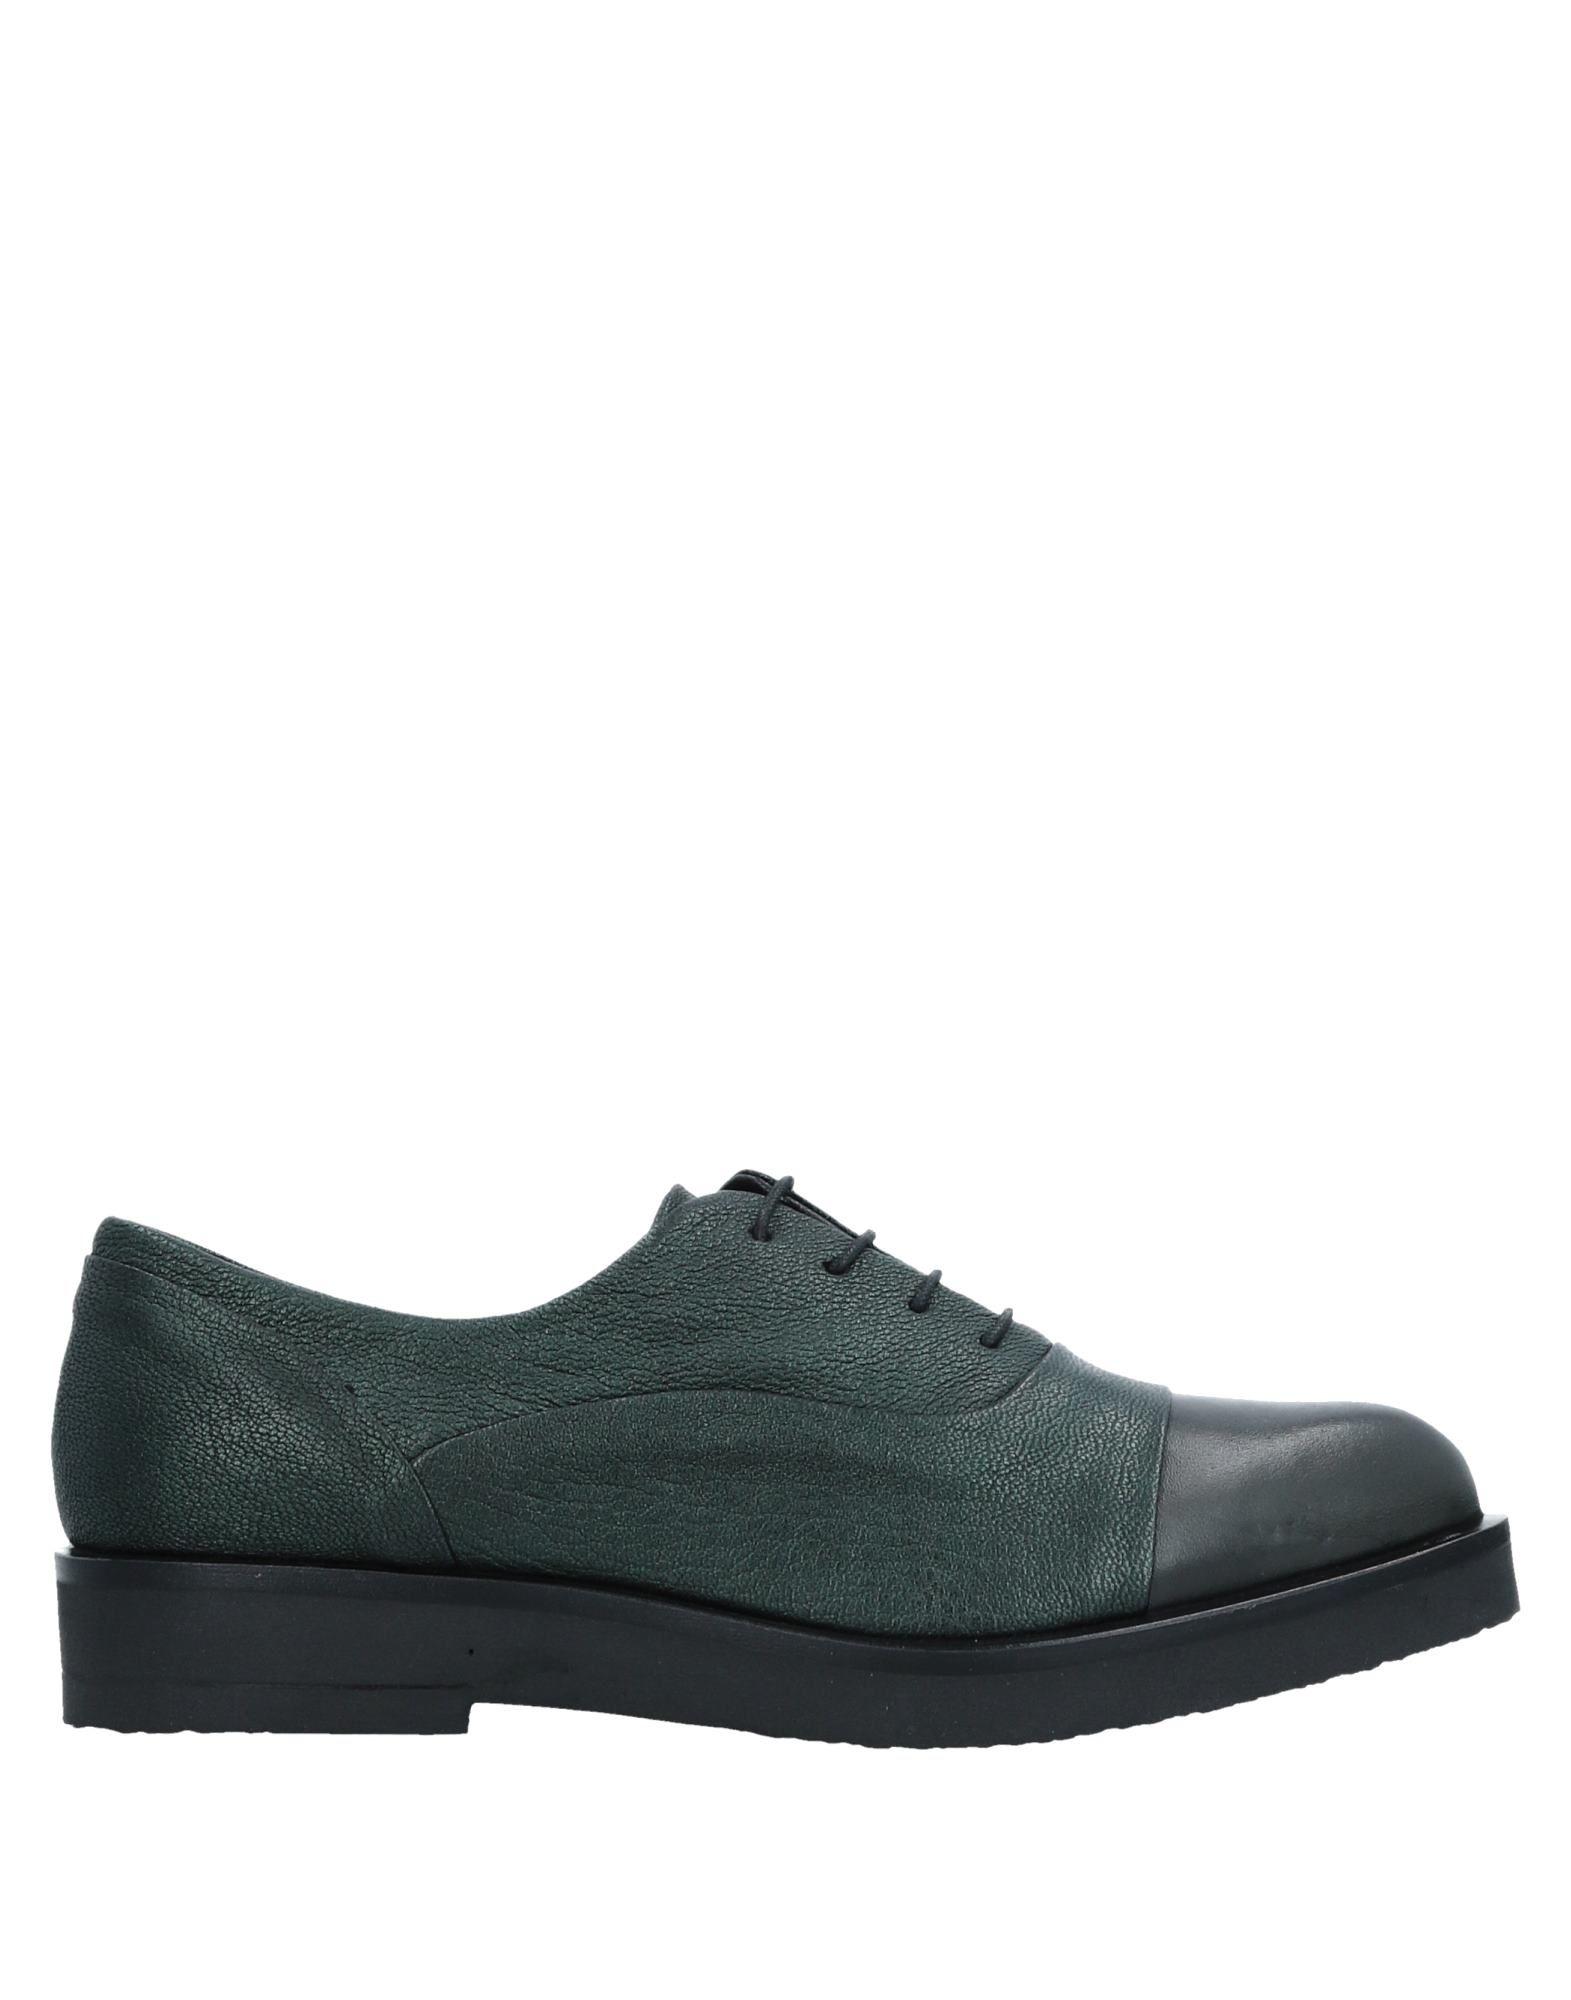 Фото - LILIMILL Обувь на шнурках обувь на высокой платформе dkny